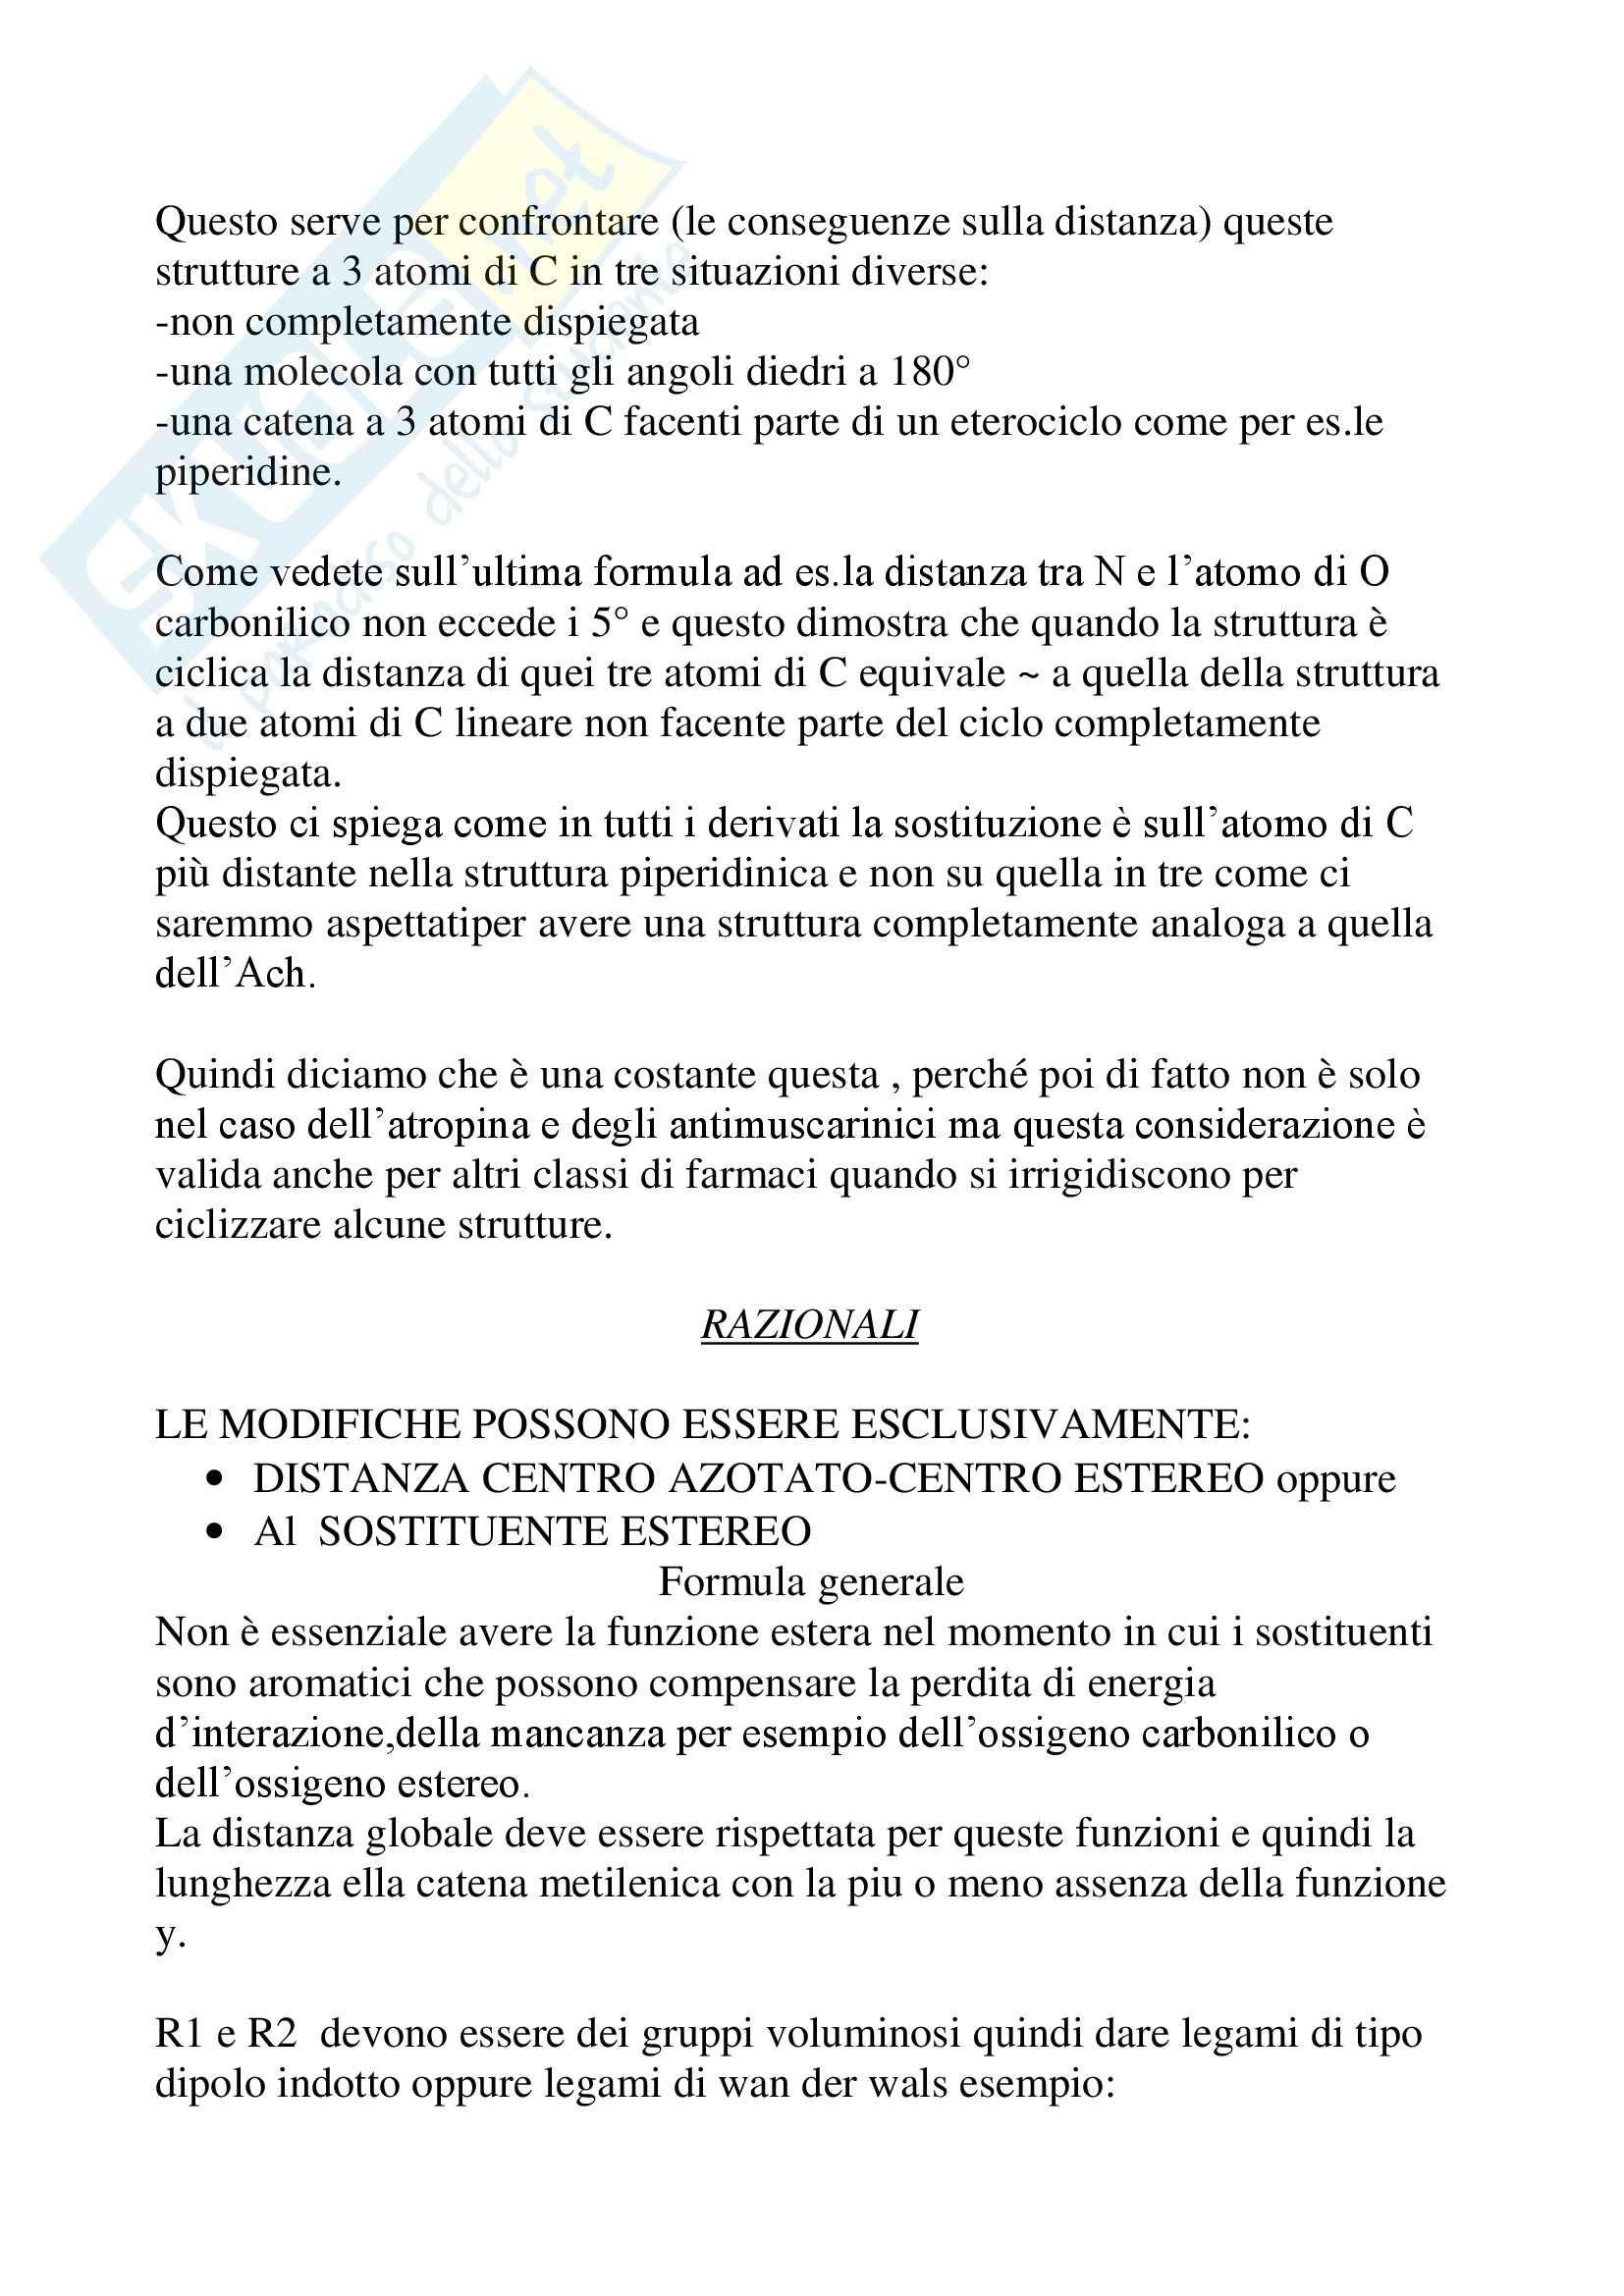 Chimica farmaceutica - antagonisti muscarinici Pag. 6